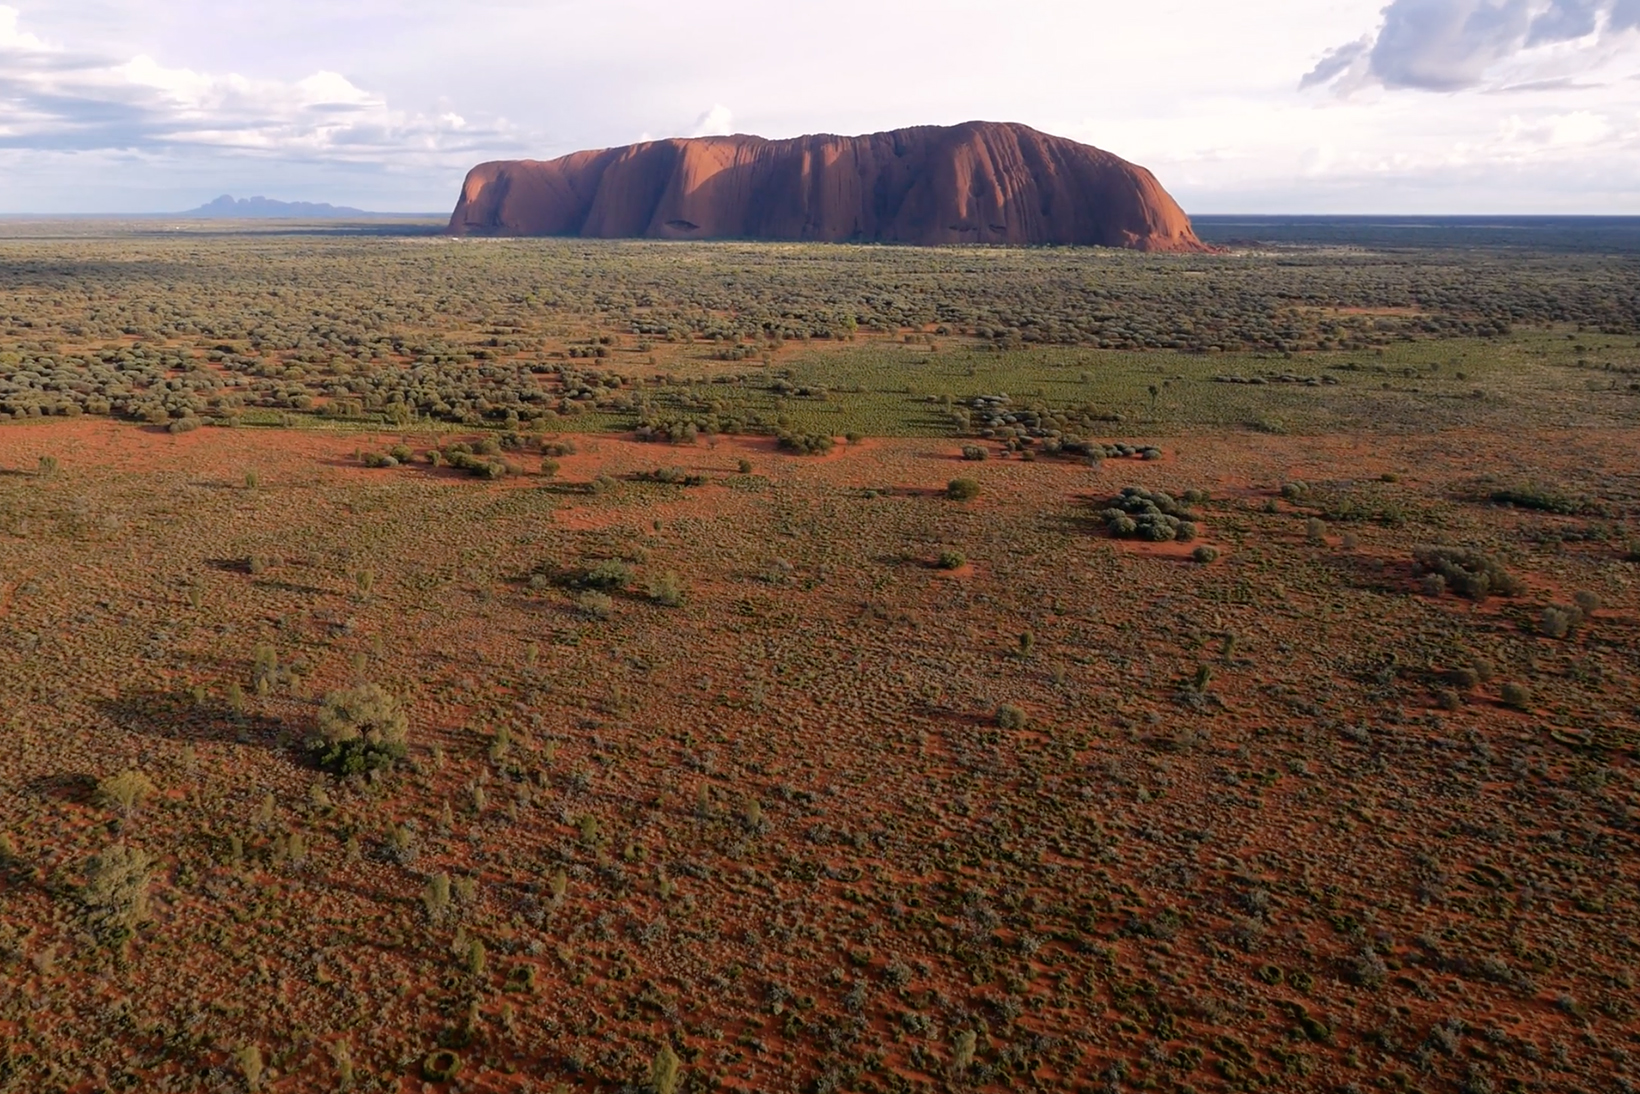 A Drone's-Eye View of Uluru